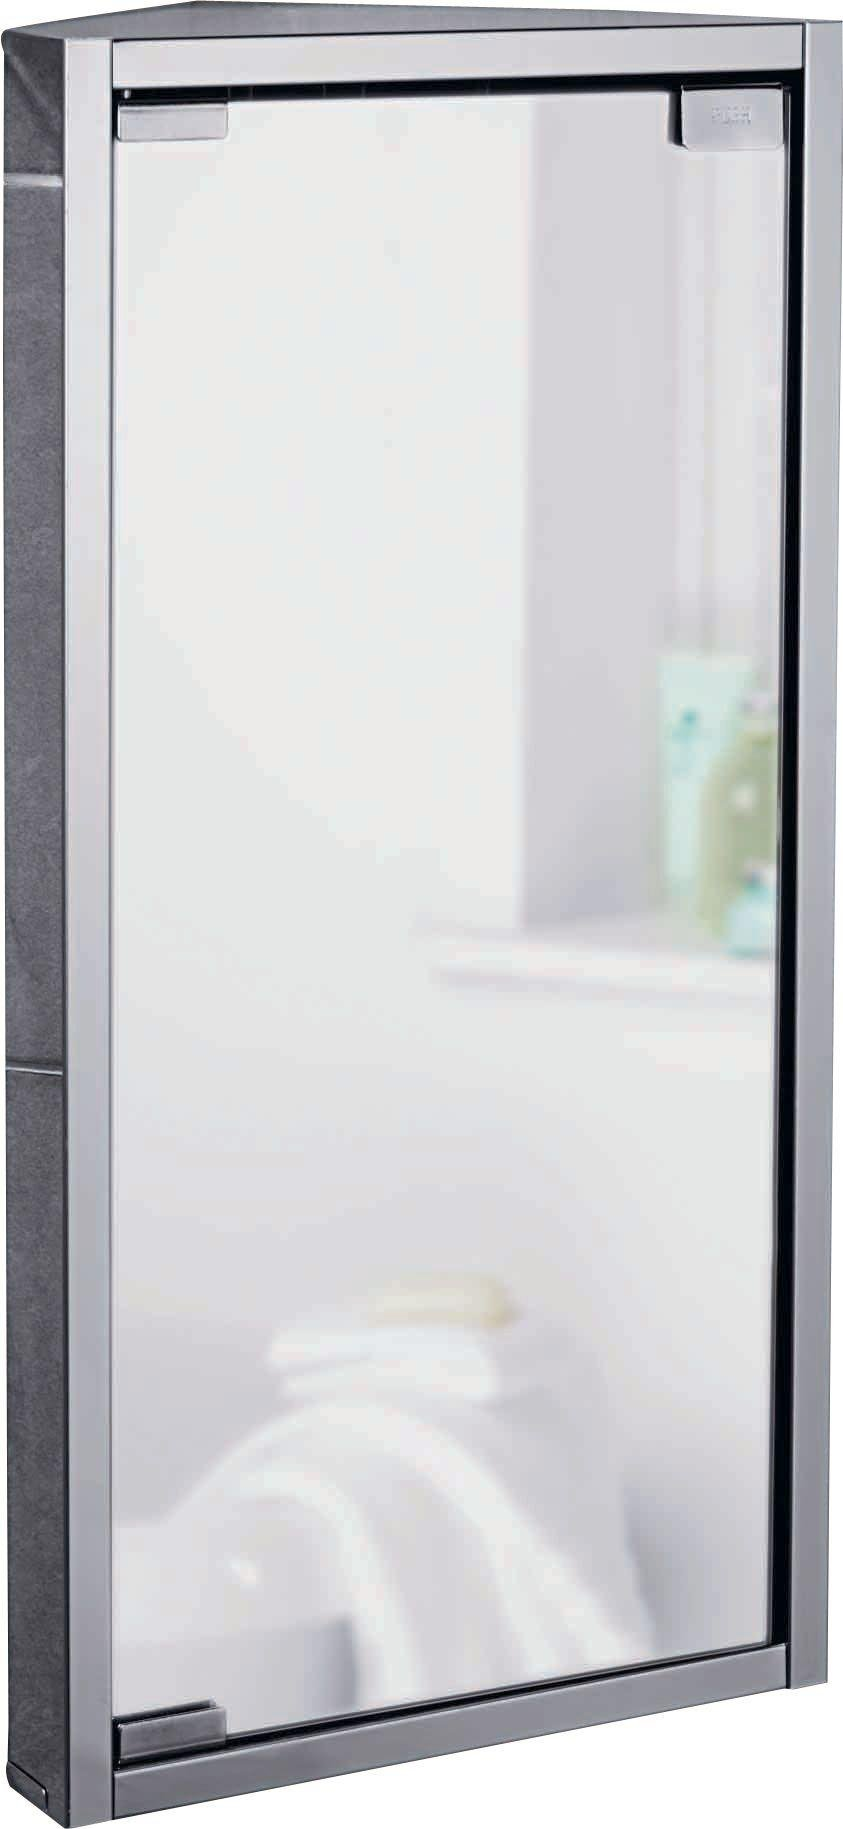 buy argos home mirrored stainless steel corner bathroom cabinet rh argos co uk bathroom corner cabinet with mirror india corner bathroom mirror cabinet uk